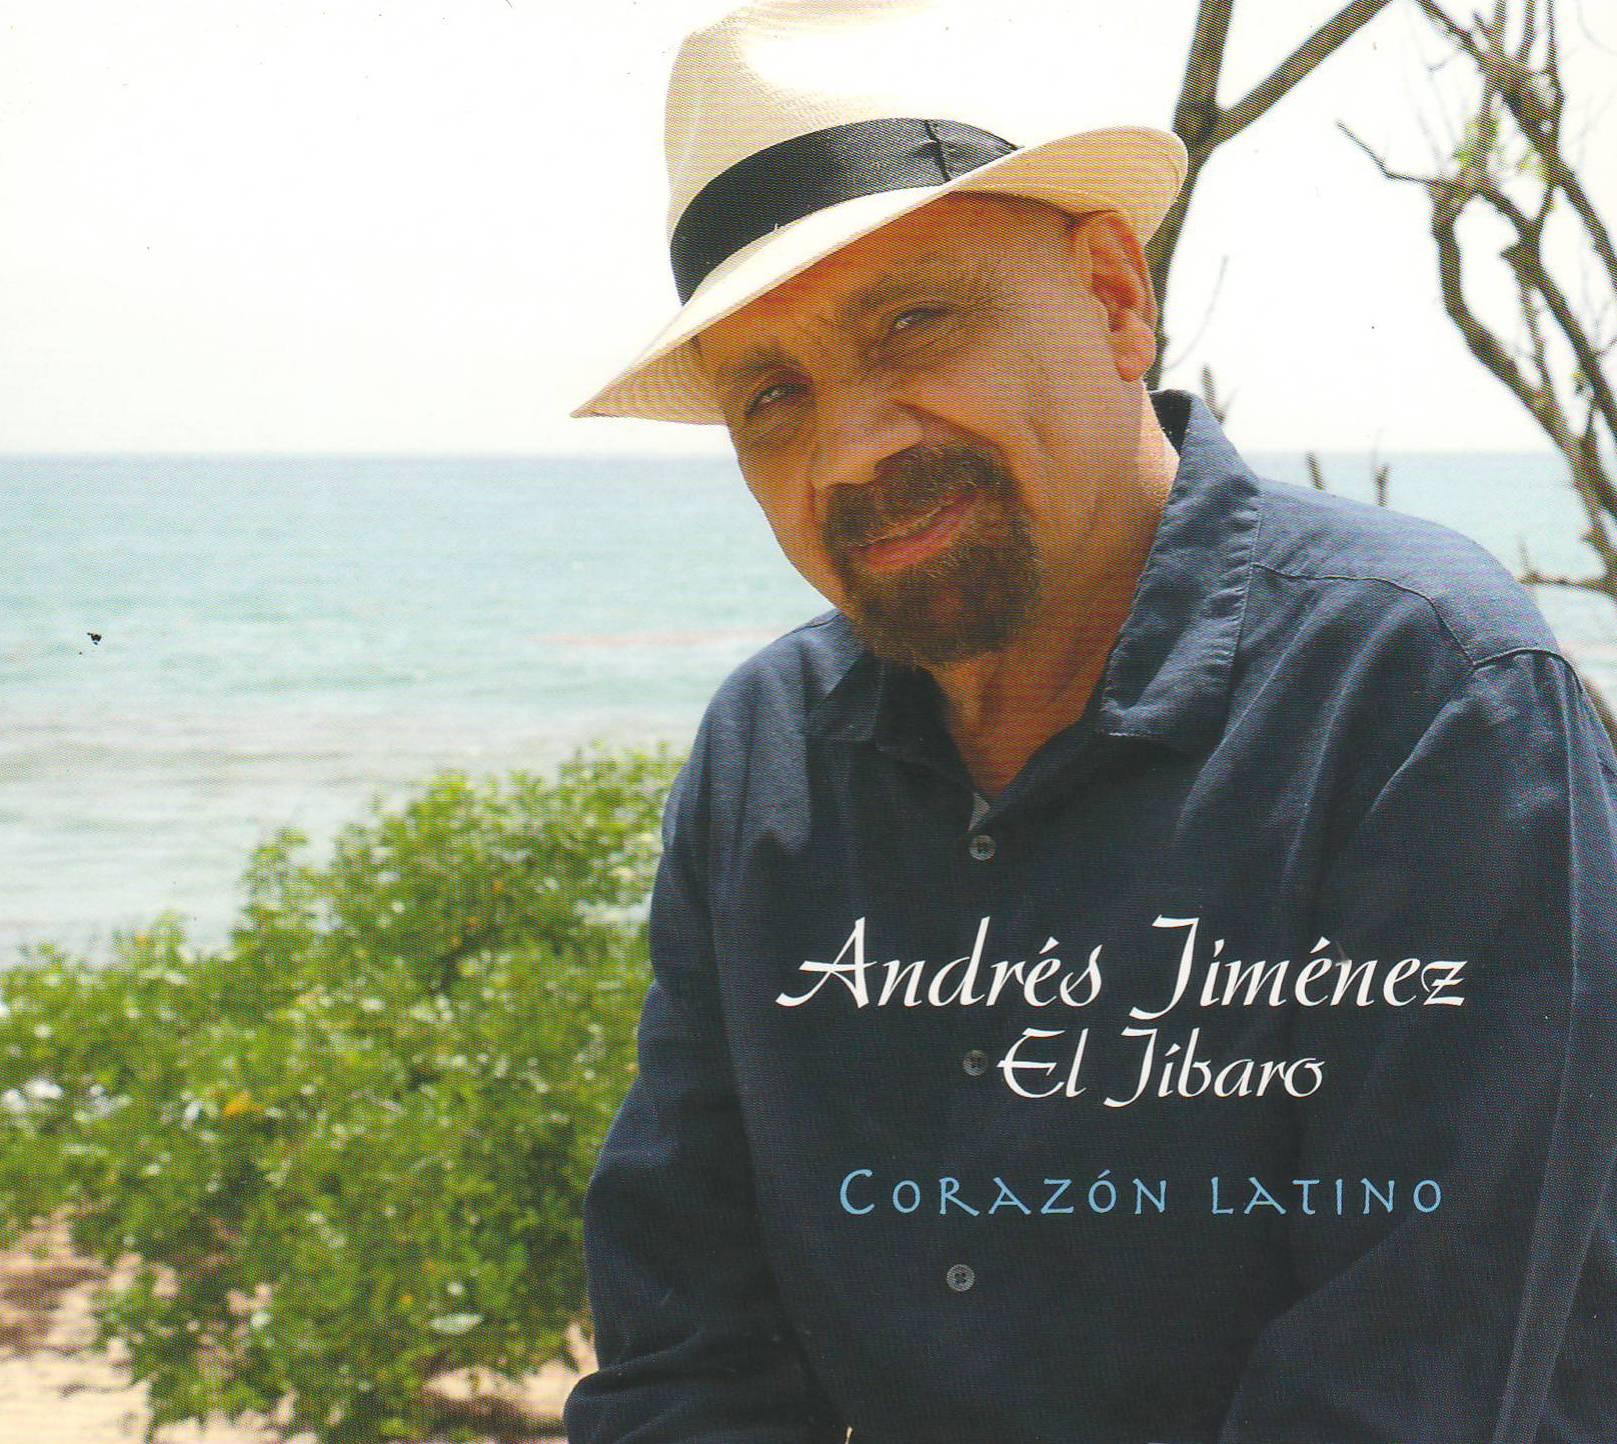 andres jimenez - 2015 - corazón latino